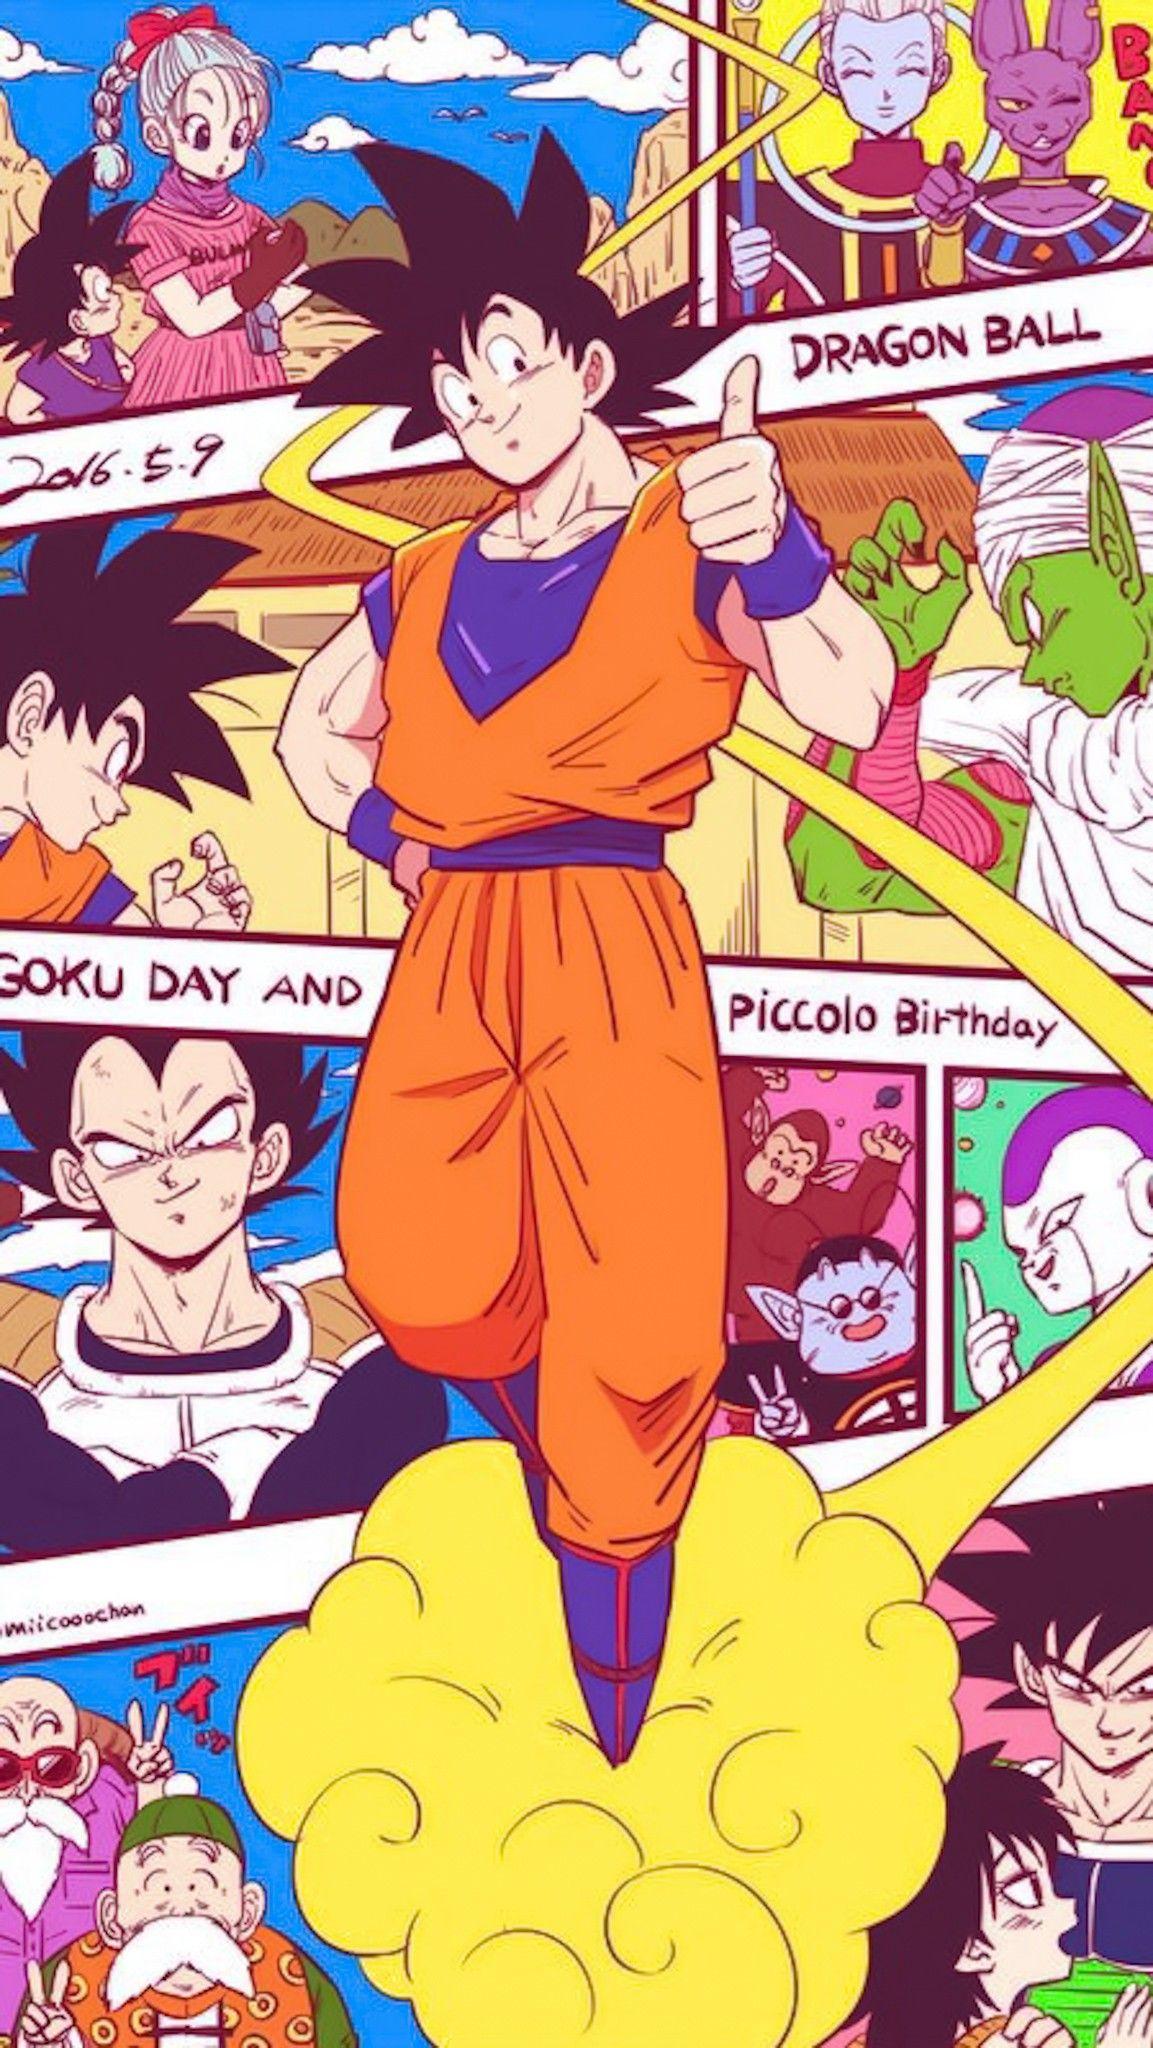 Pin By Miroslaw Szukielowicz On Bg Ctn Dragon Ball Goku Anime Dragon Ball Super Dragon Ball Wallpapers